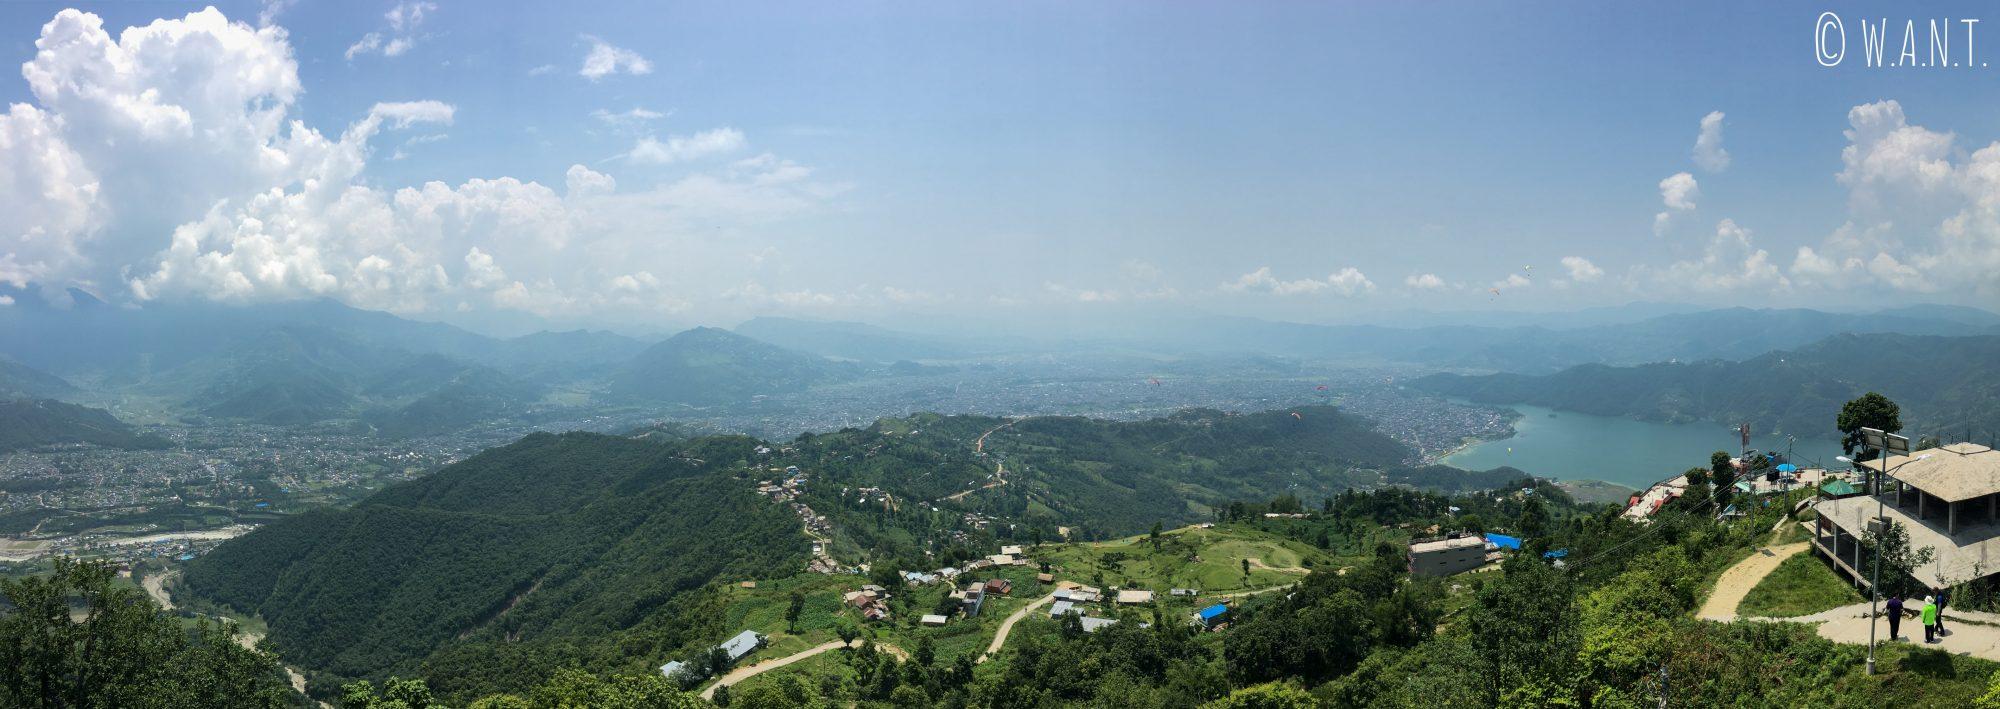 Panorama depuis la colline de Sarangkot